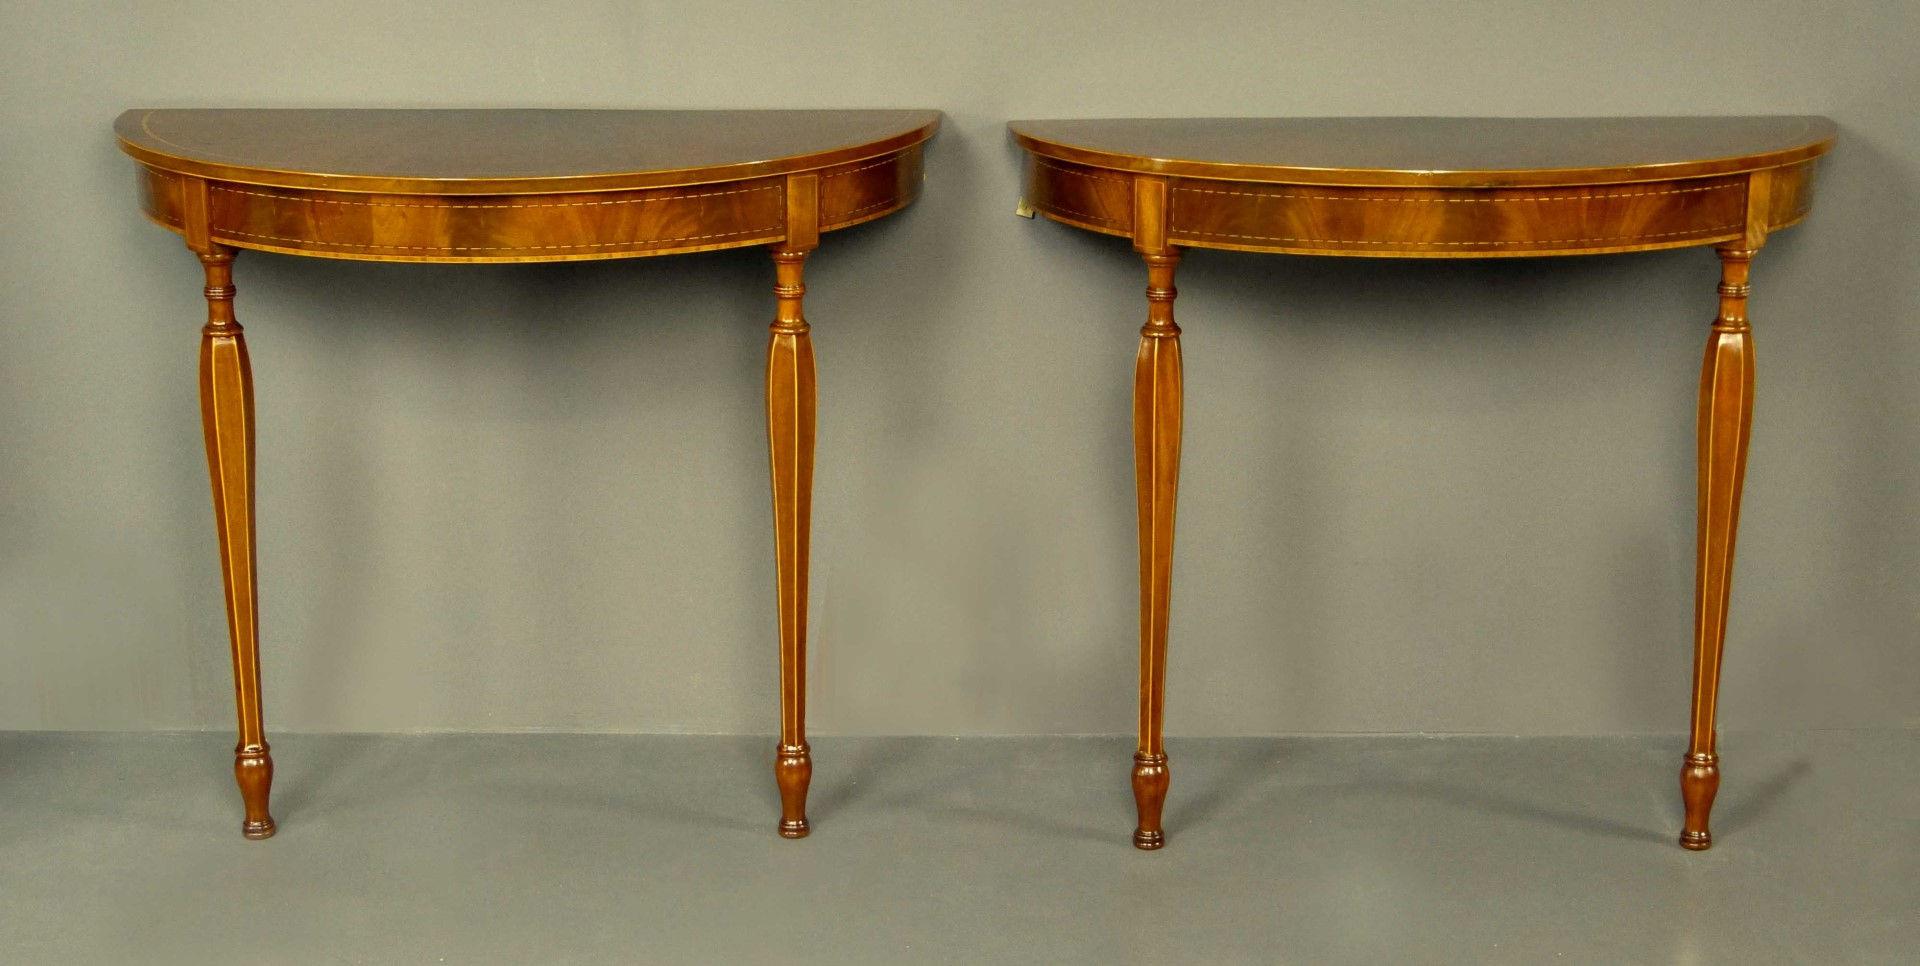 Mesas consolas mesas consolas consolas antiguas pareja - Mesas de recibidor antiguas ...